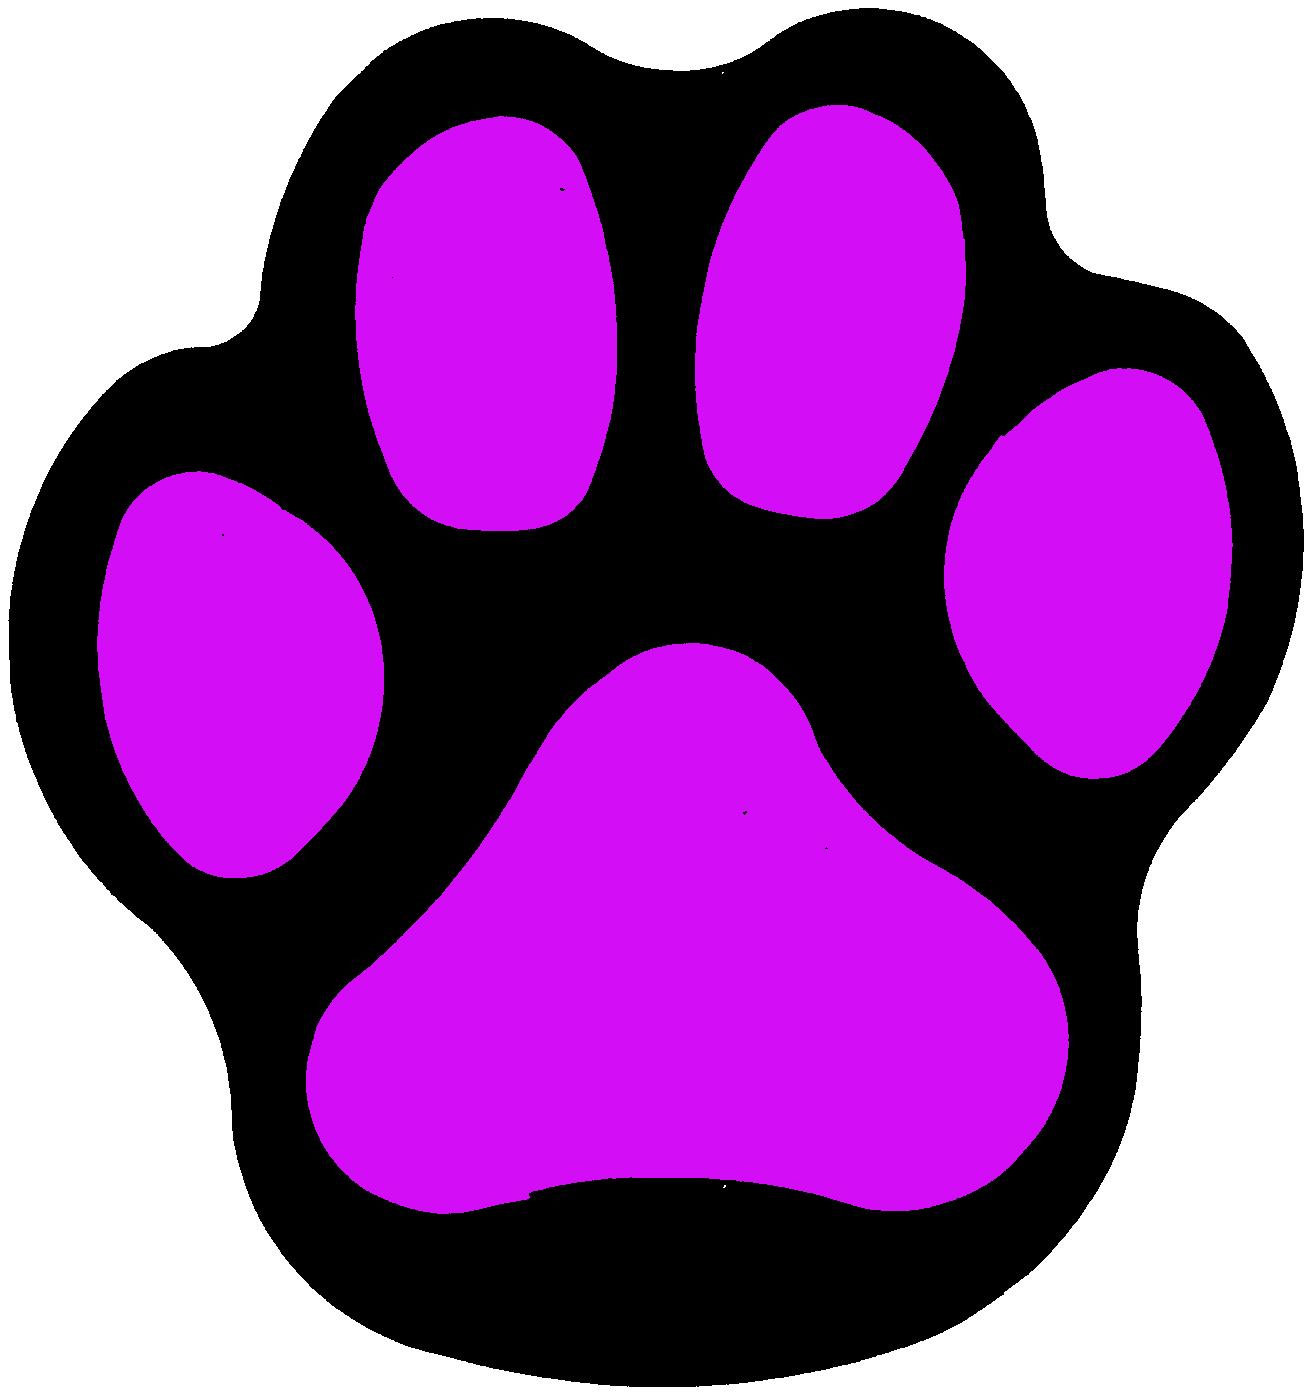 purple bobcat paw print clip art free image rh pixy org  bobcat paw print clip art free